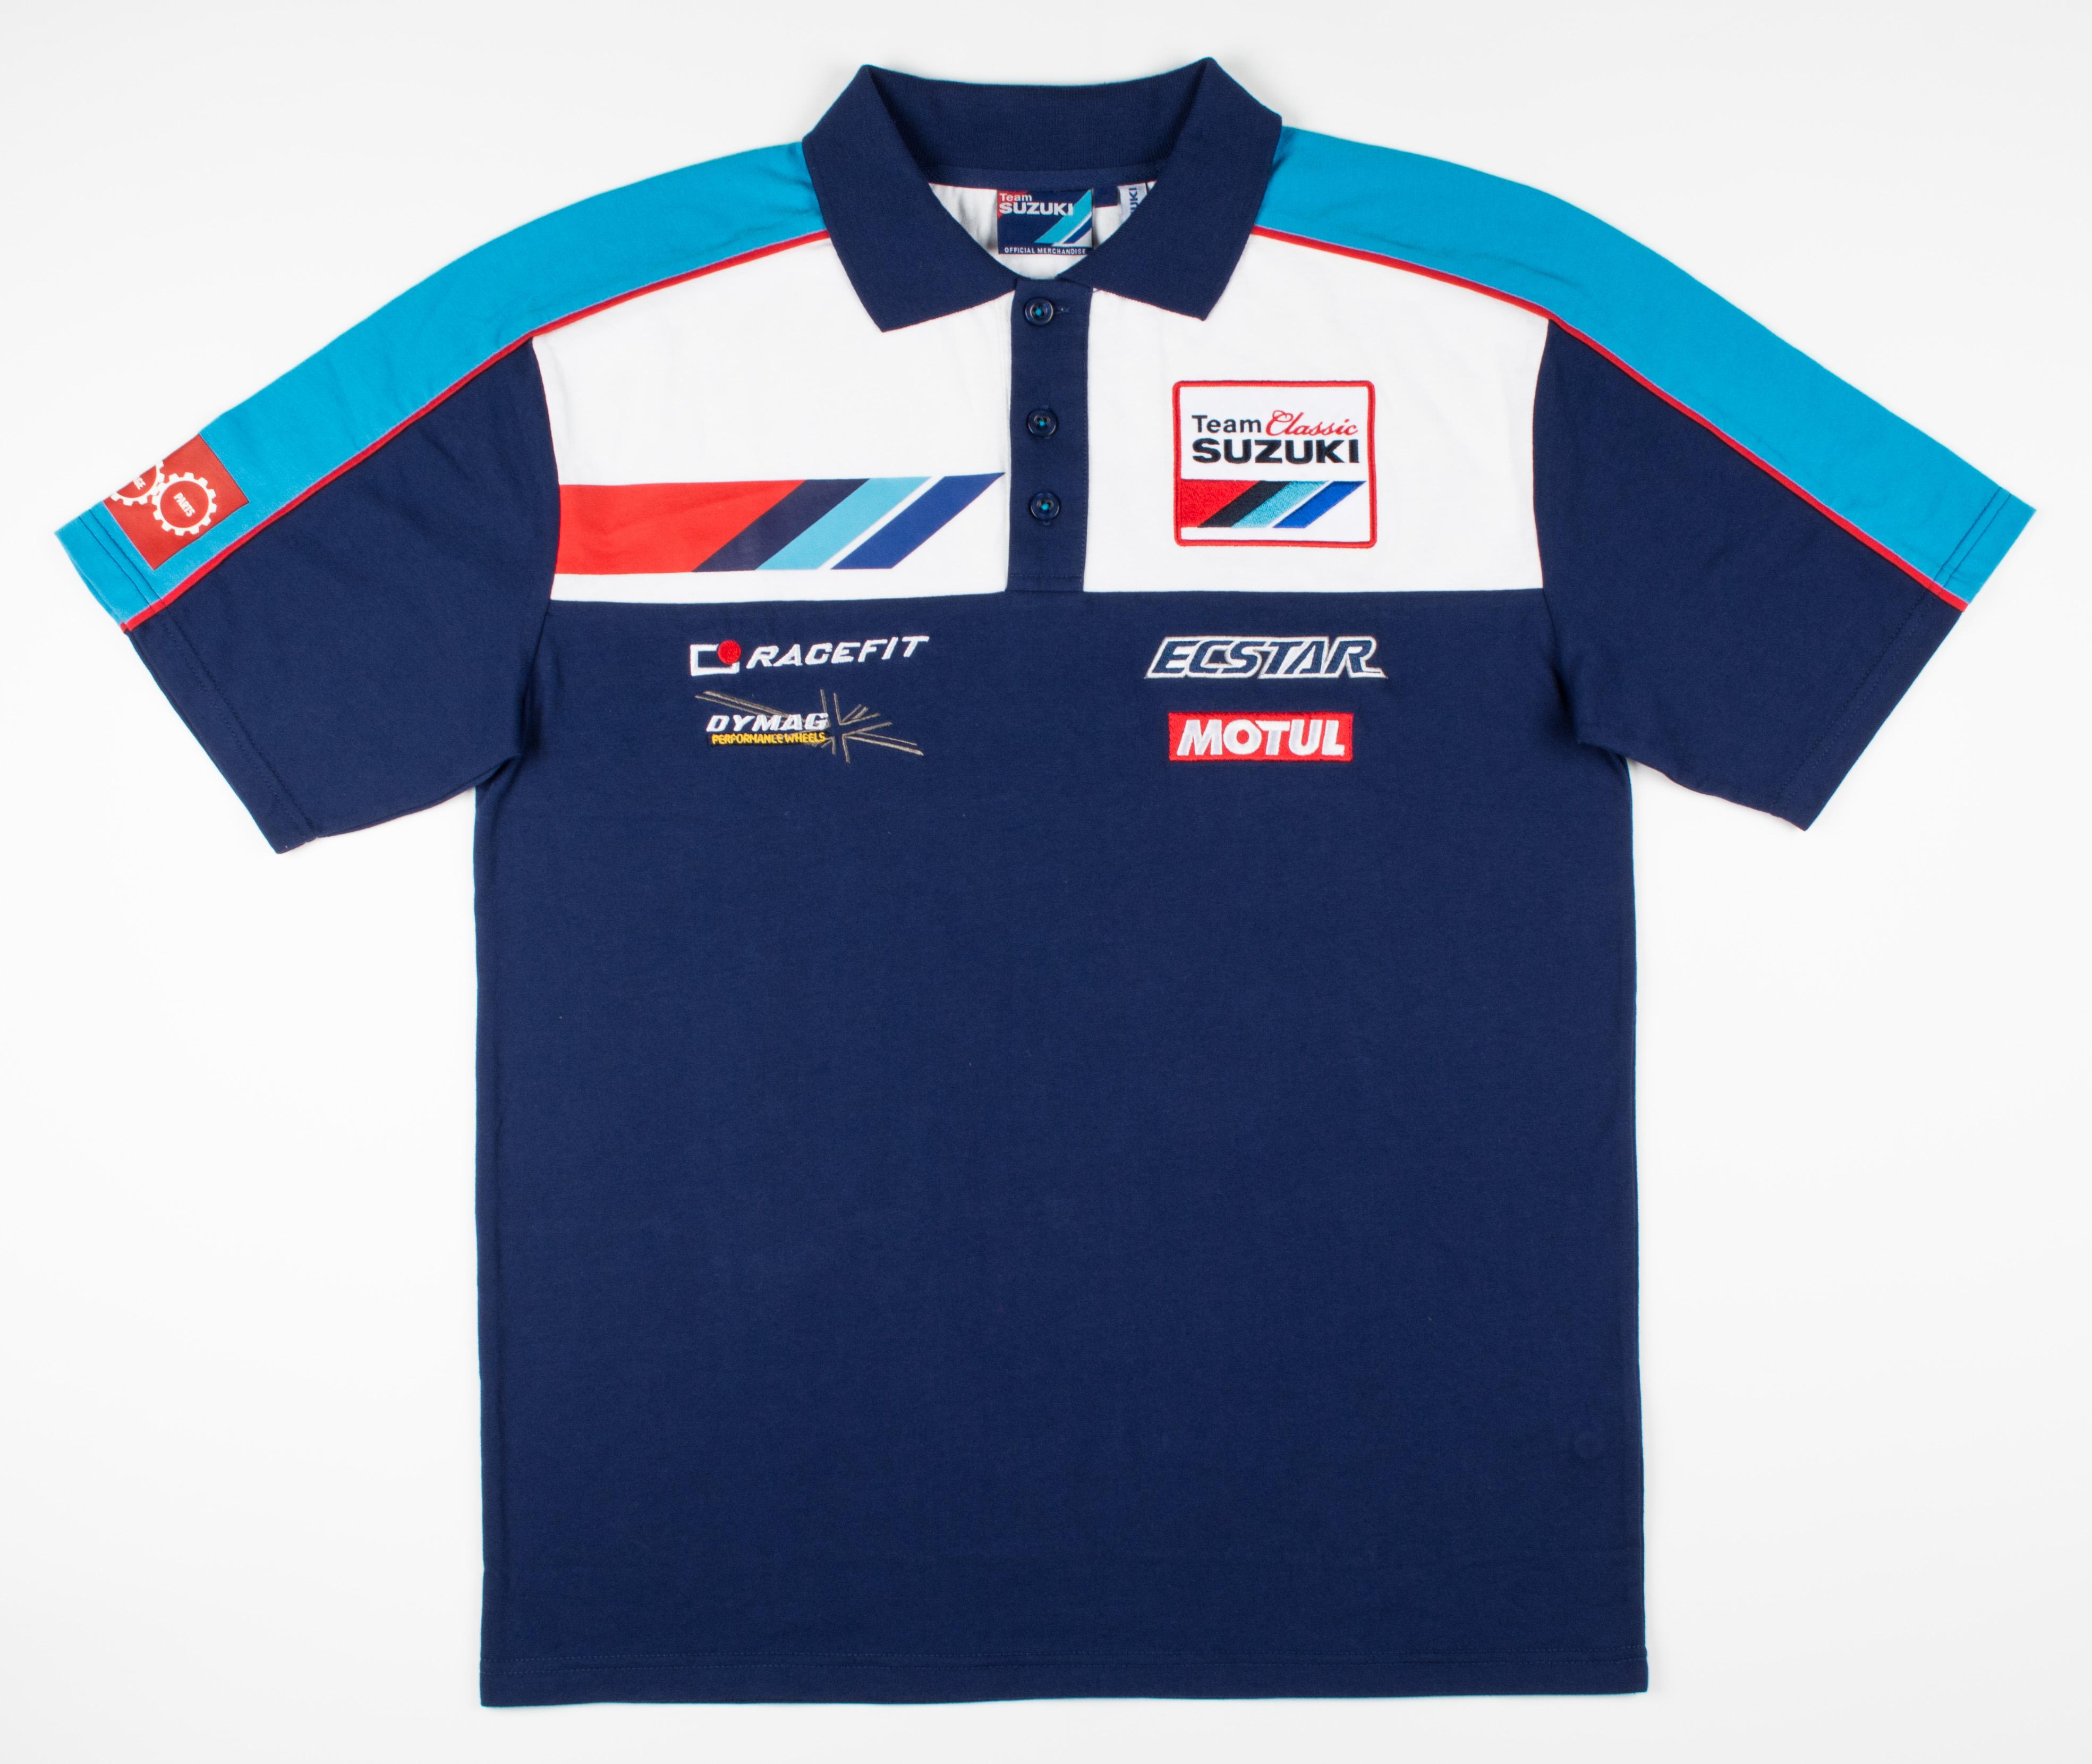 New Team Clic Suzuki Clothing Launched   Team Clic Suzuki